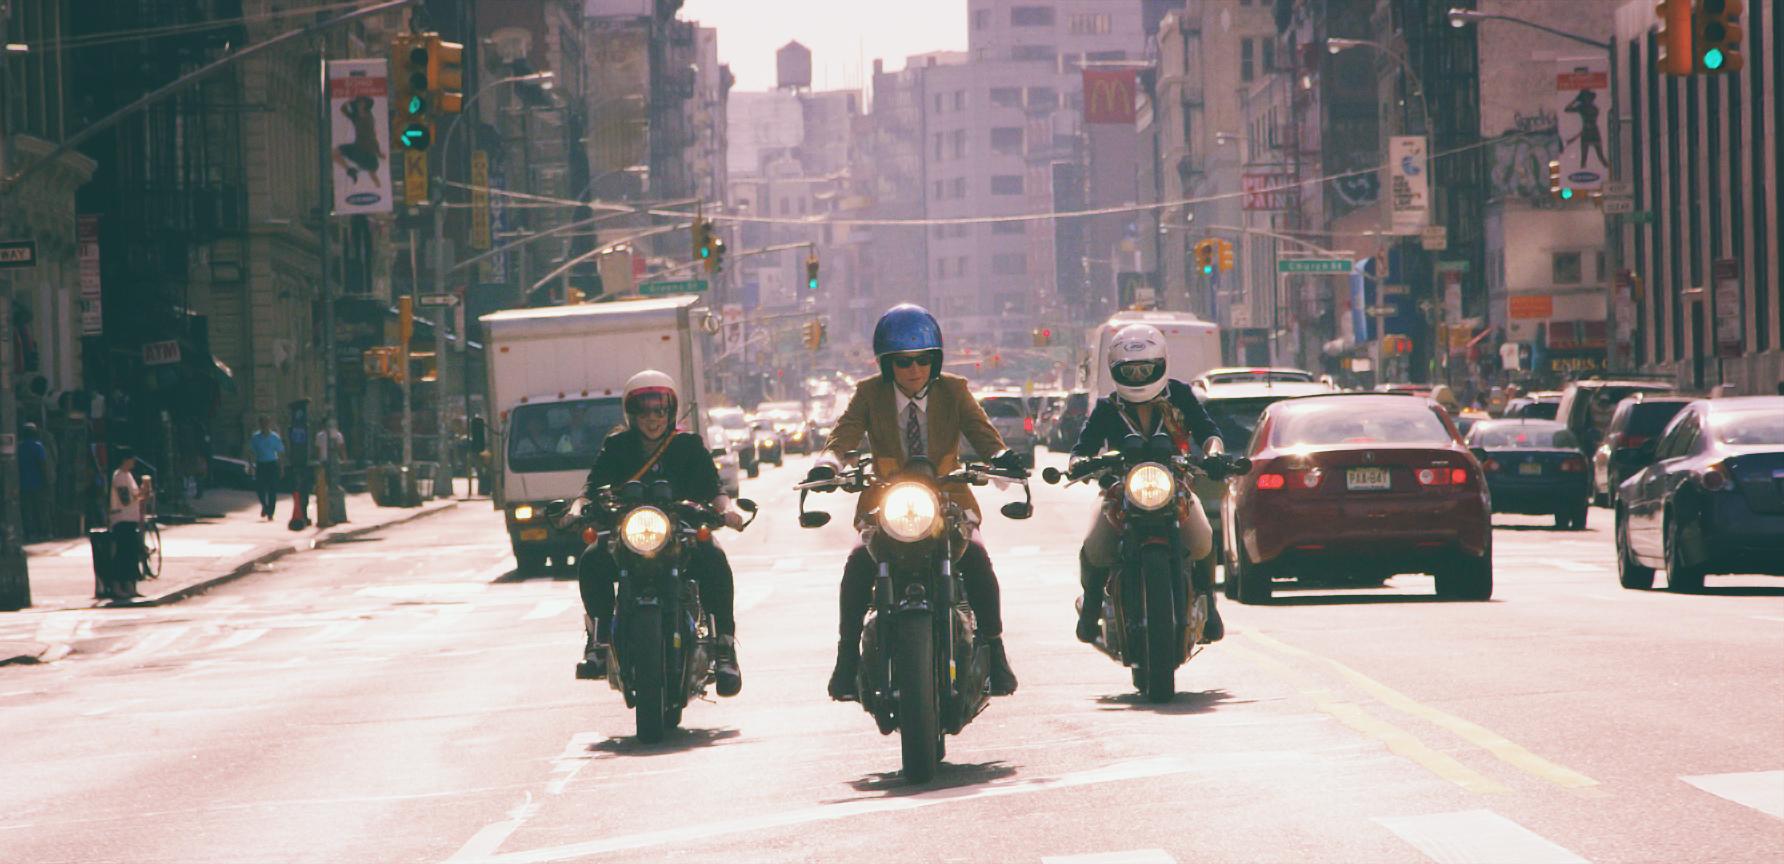 Stories_of_Bike_Discovery_Thumb.jpg